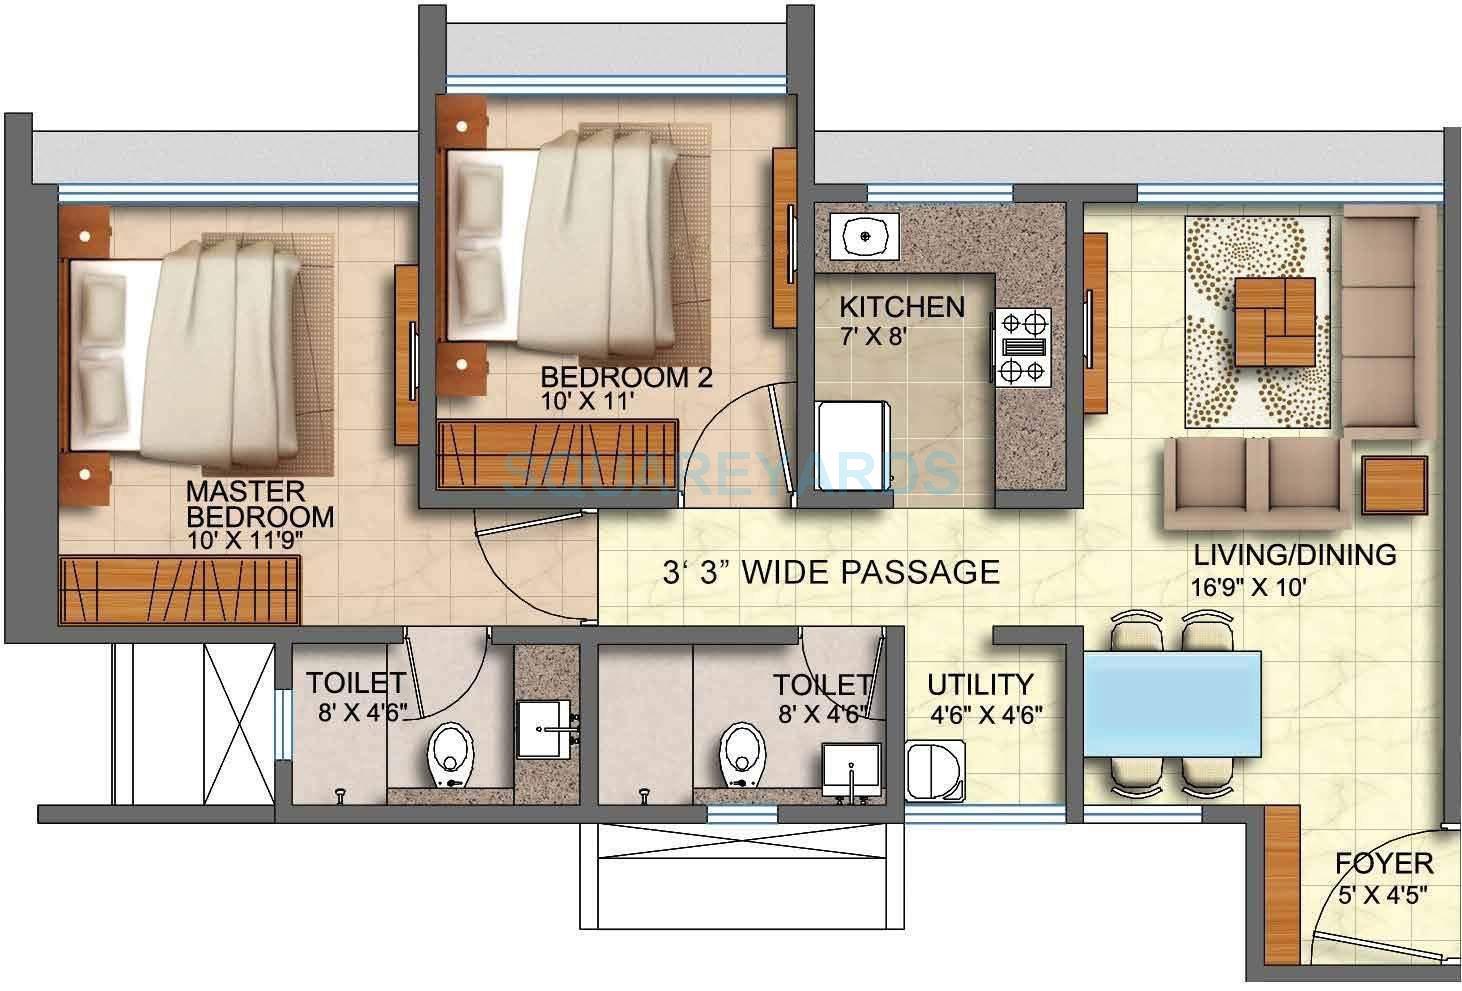 runwal forests apartment 2bhk 1025sqft1